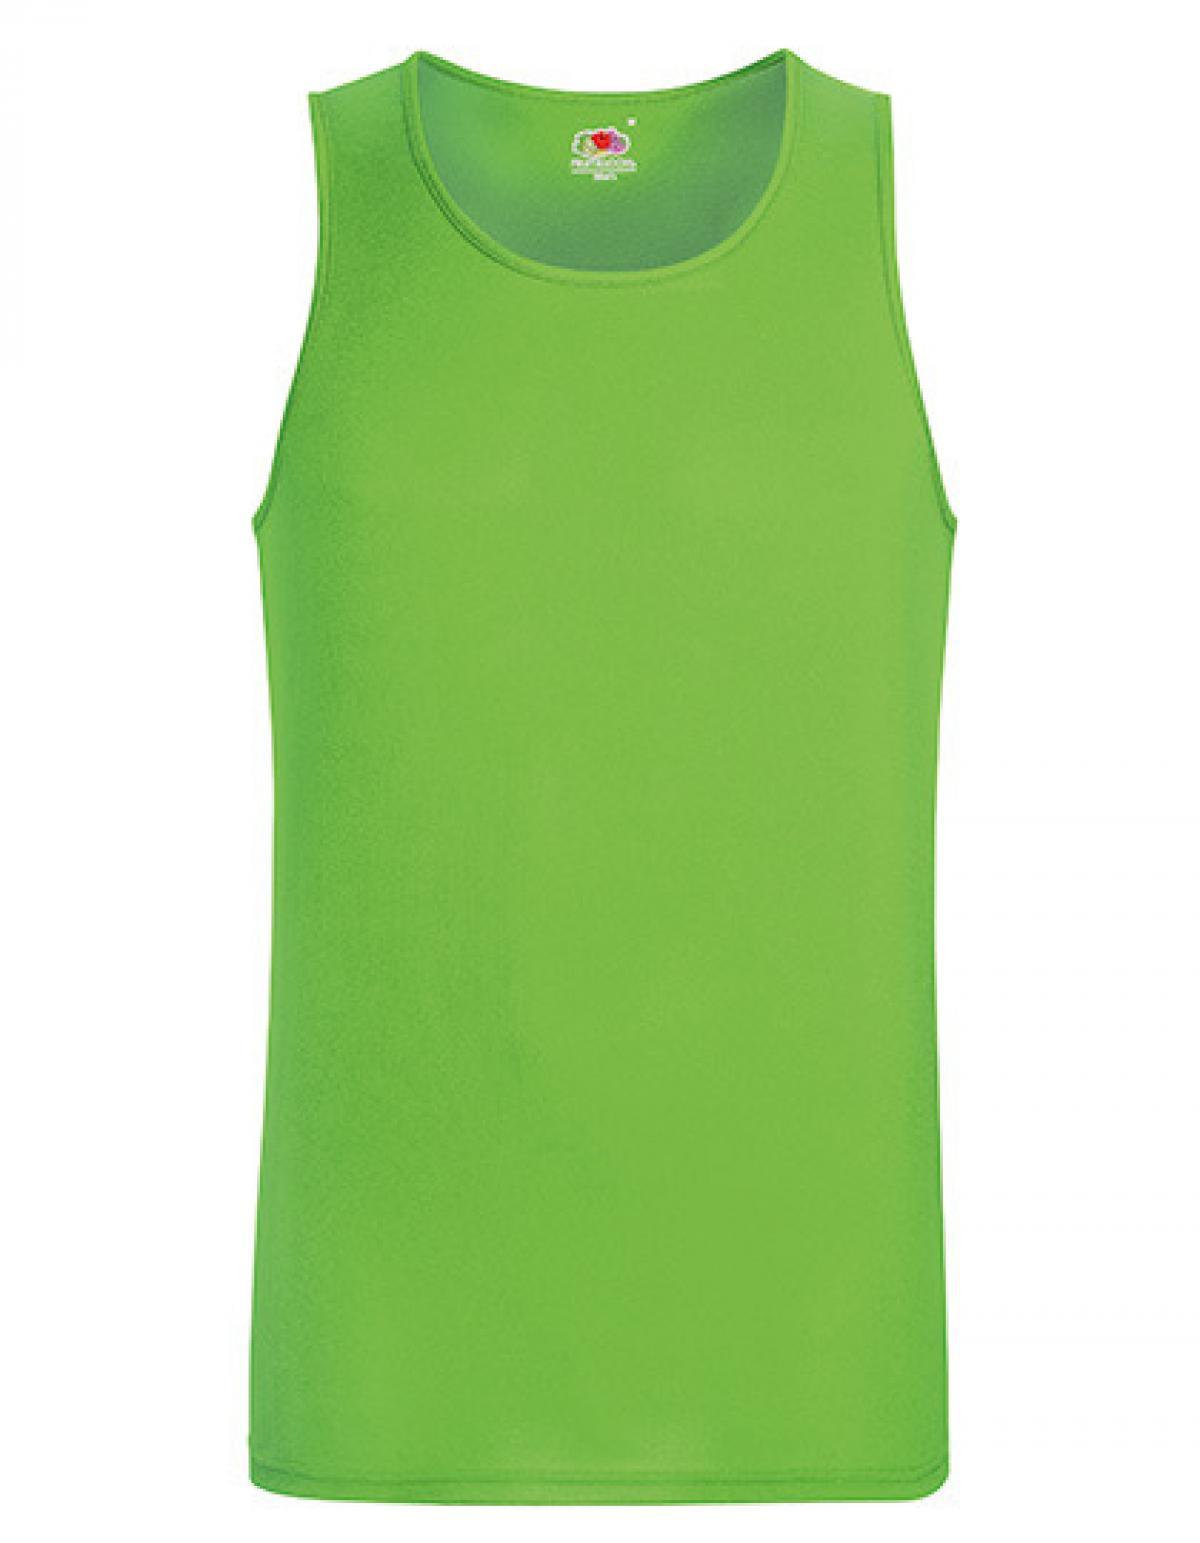 herren performance vest tank top sport t shirt rexlander s. Black Bedroom Furniture Sets. Home Design Ideas